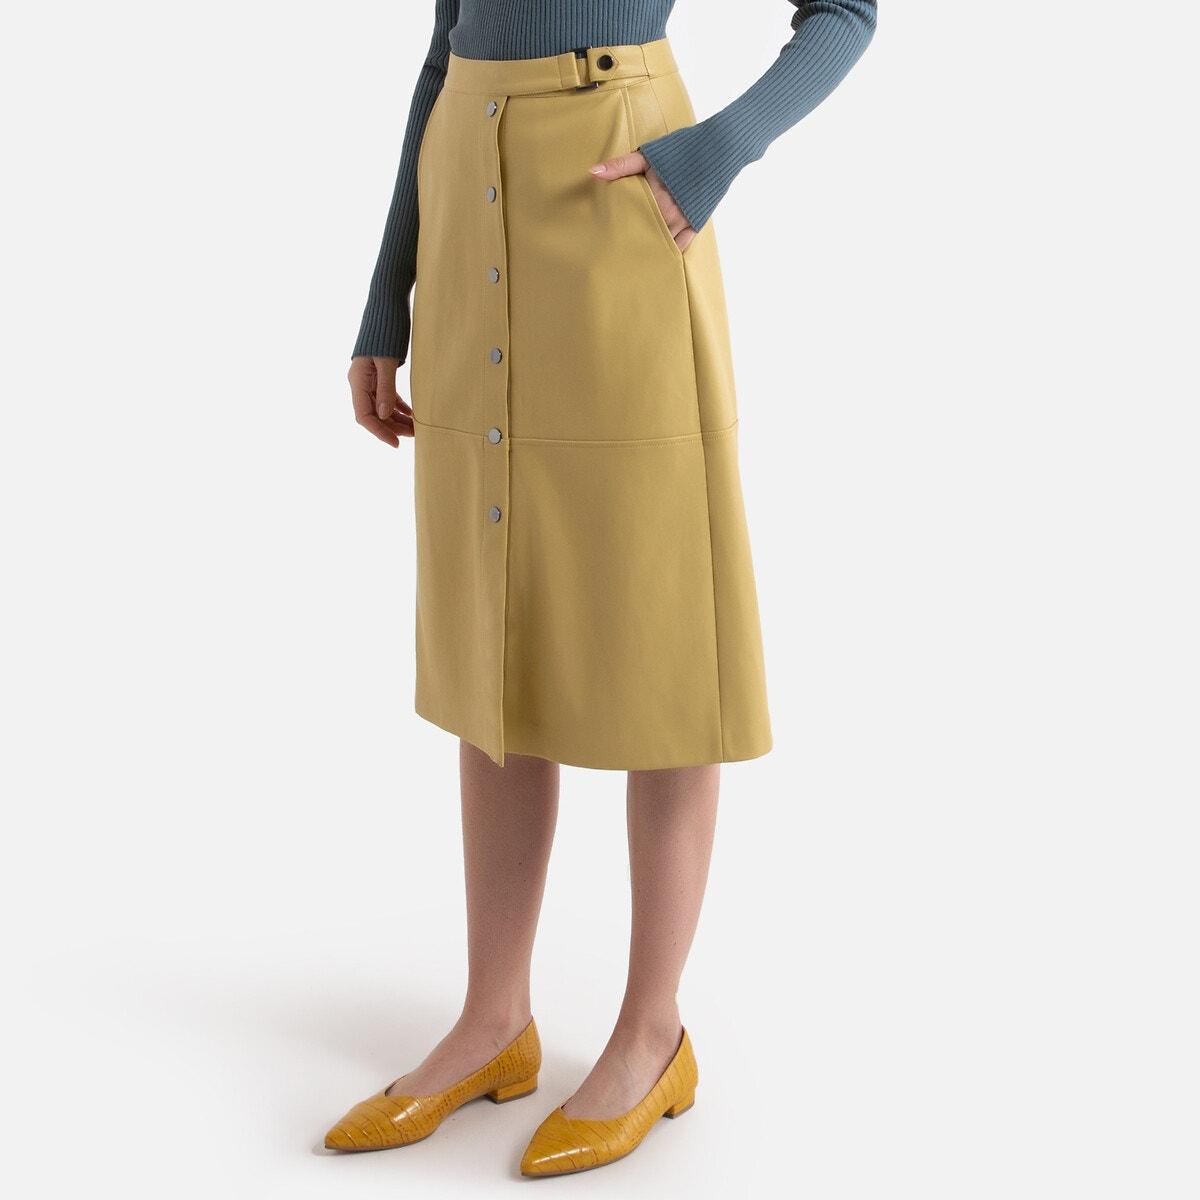 Falda recta abotonada de piel sintética